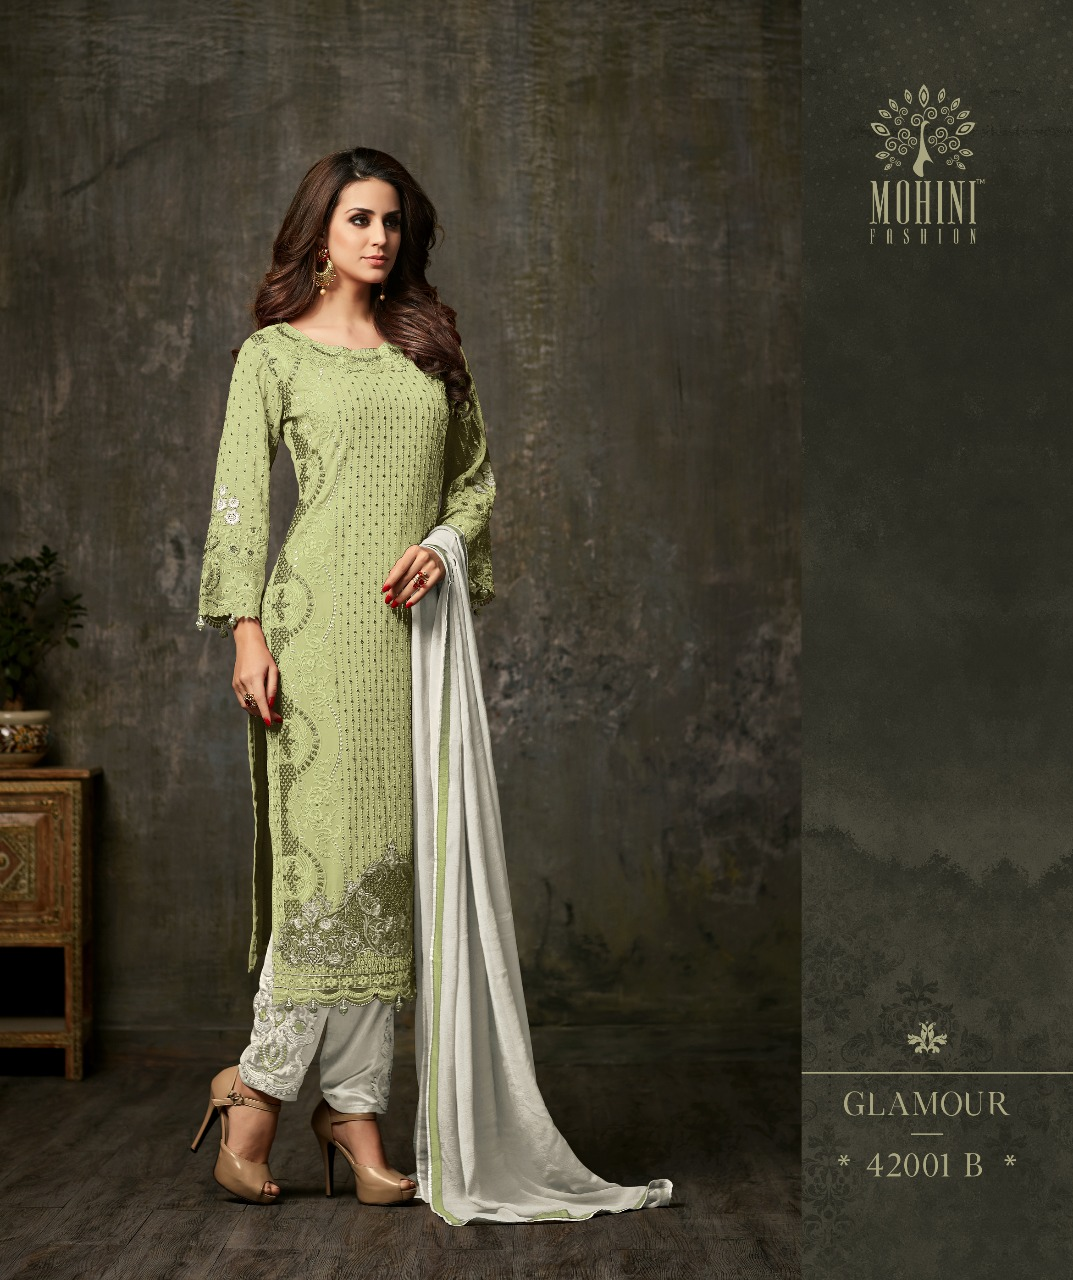 Mohini Fashion Glamour Vol 42 42001B LIGHT GREEN